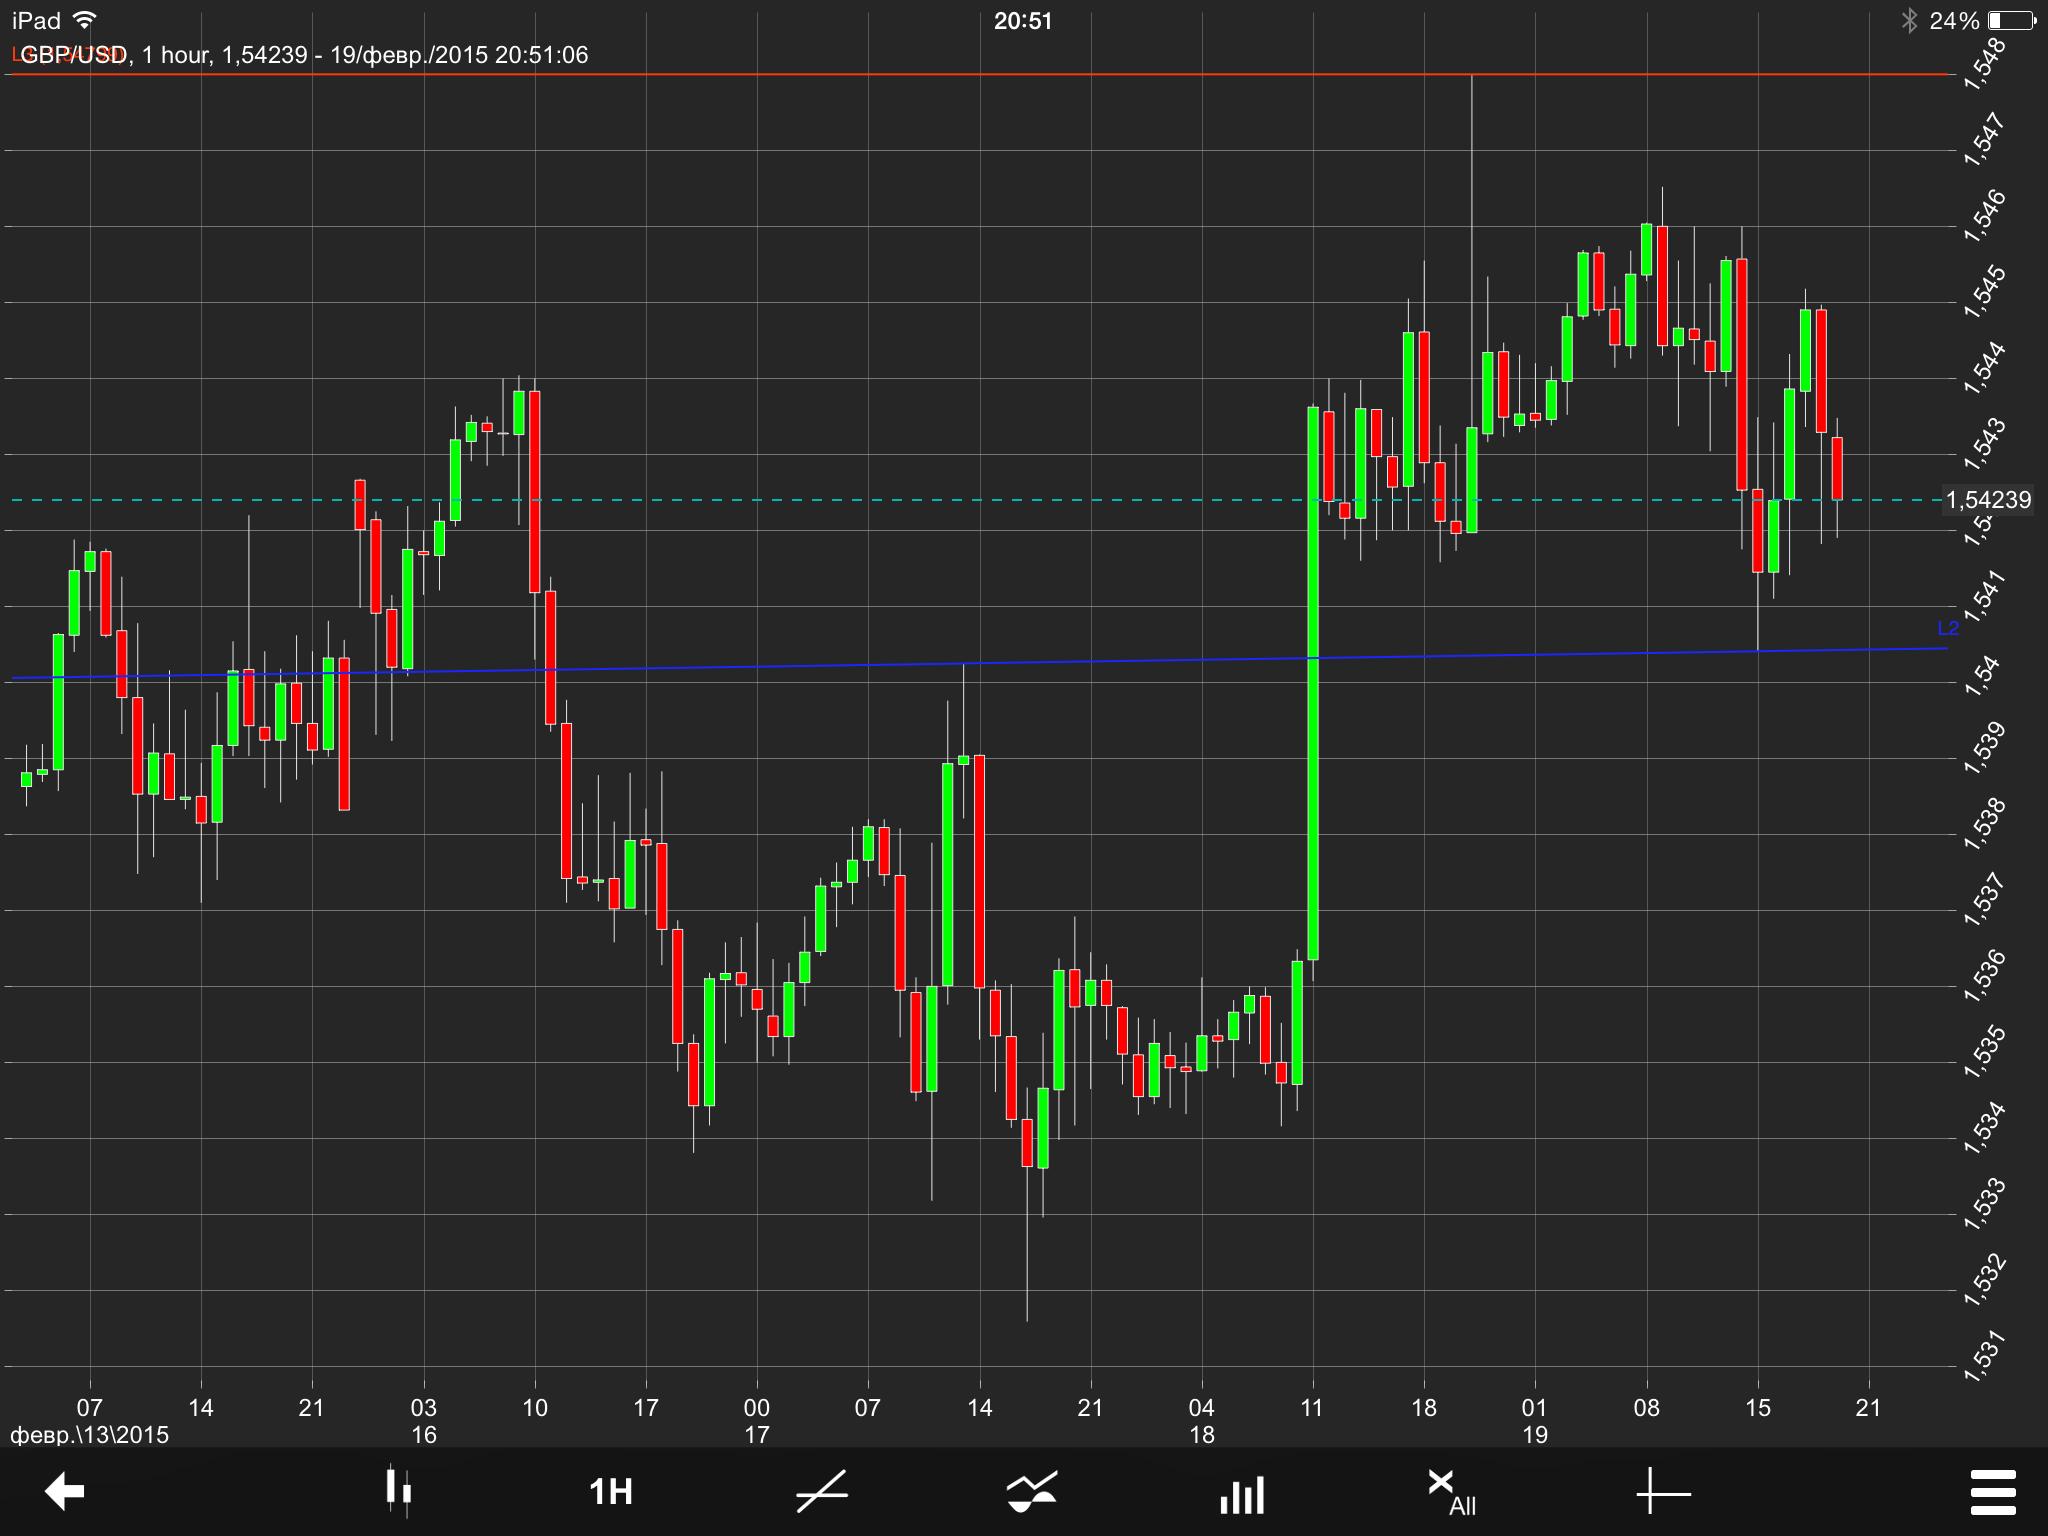 GBP/USD Chart 20 Feb 2015